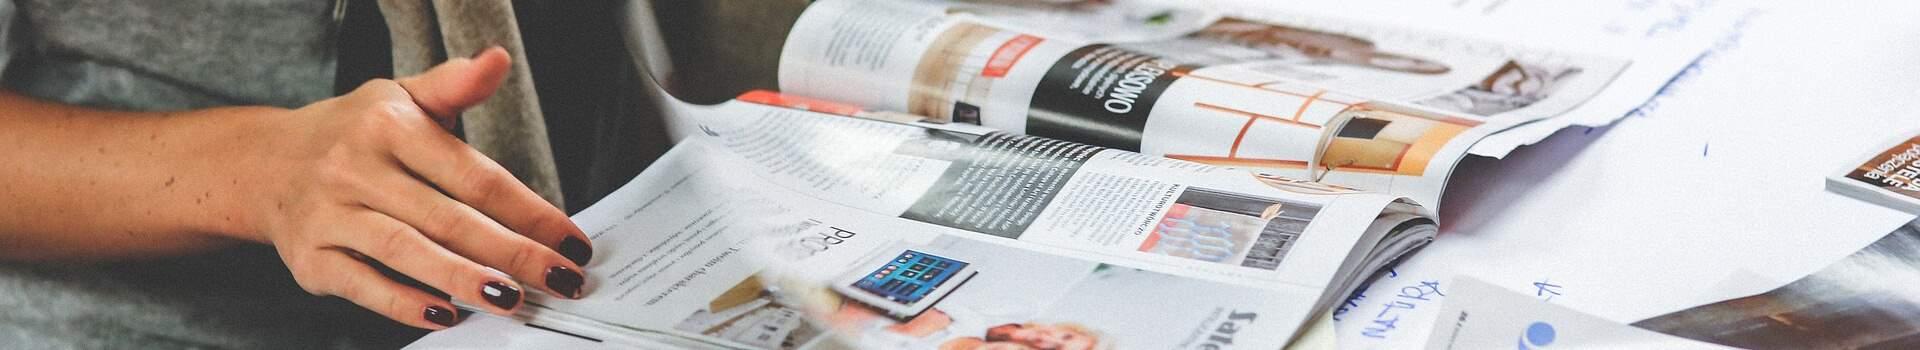 Printwerbung im Überblick